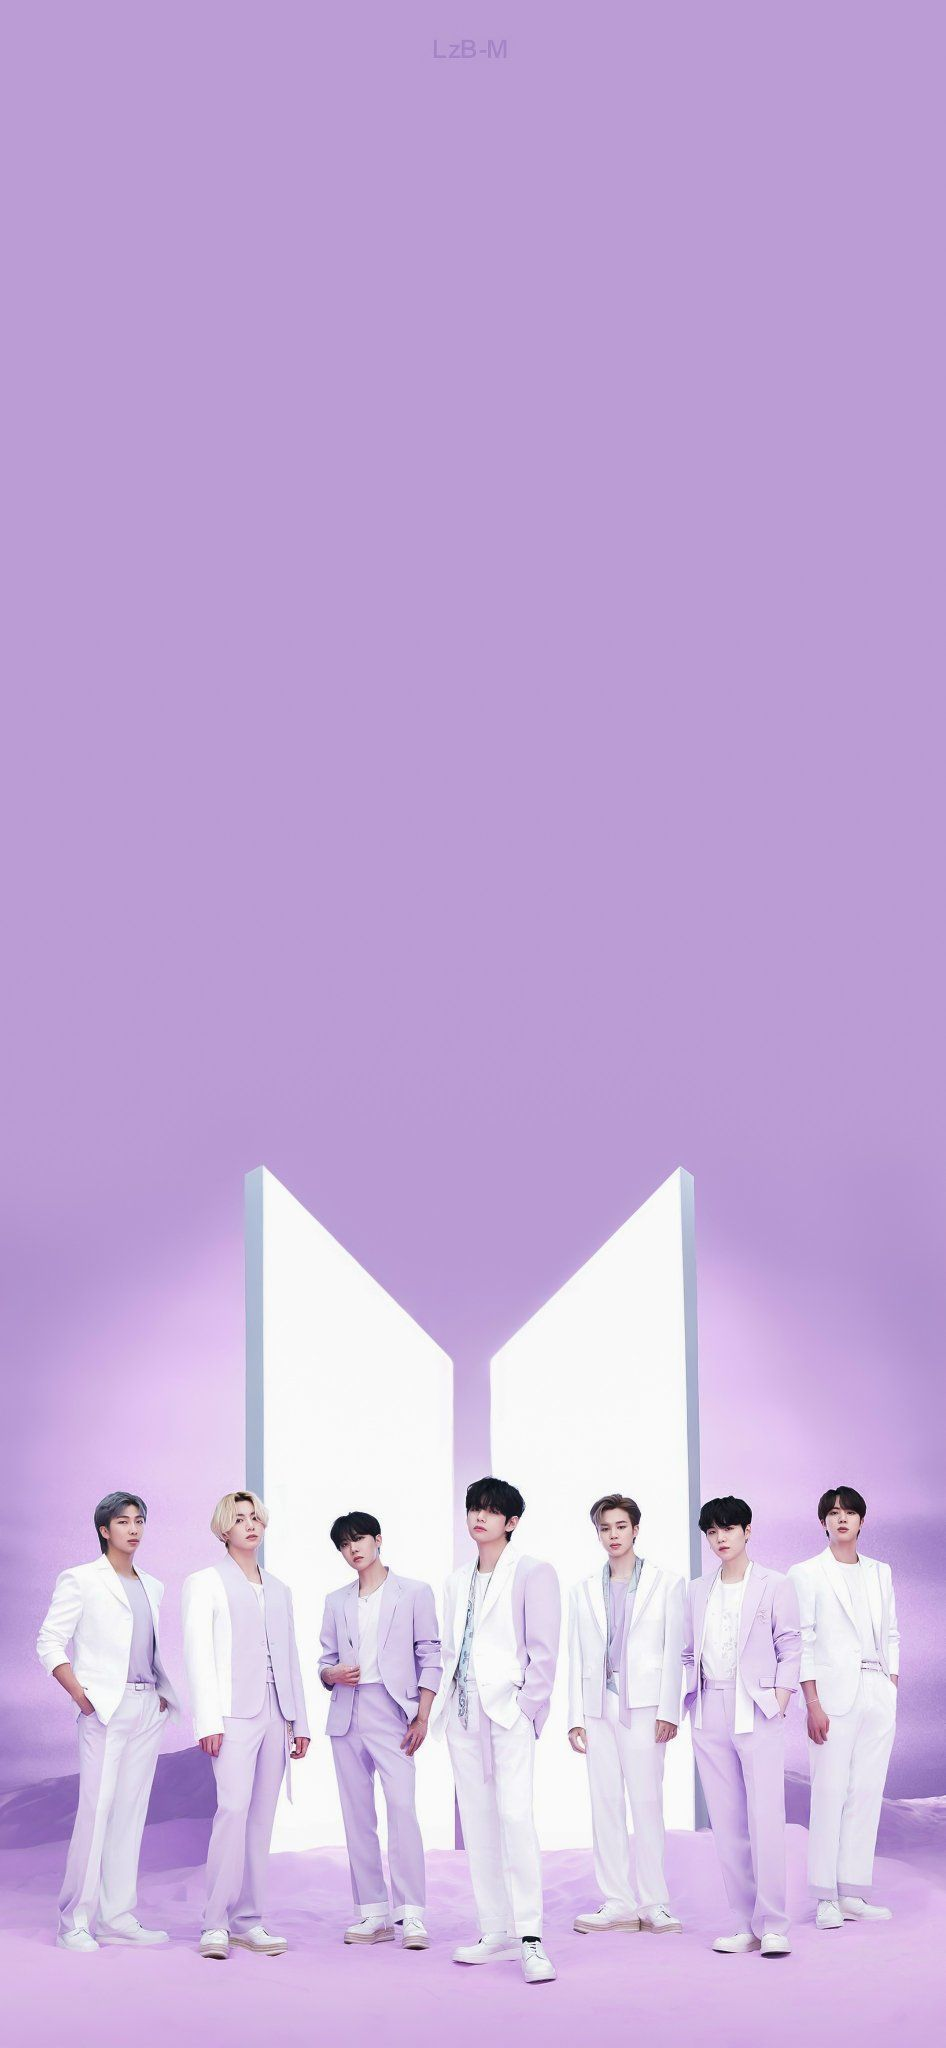 Lockscreen Bts On Twitter In 2021 Bts Beautiful Bts Wallpaper Bts Army Bts wallpaper 2021 purple